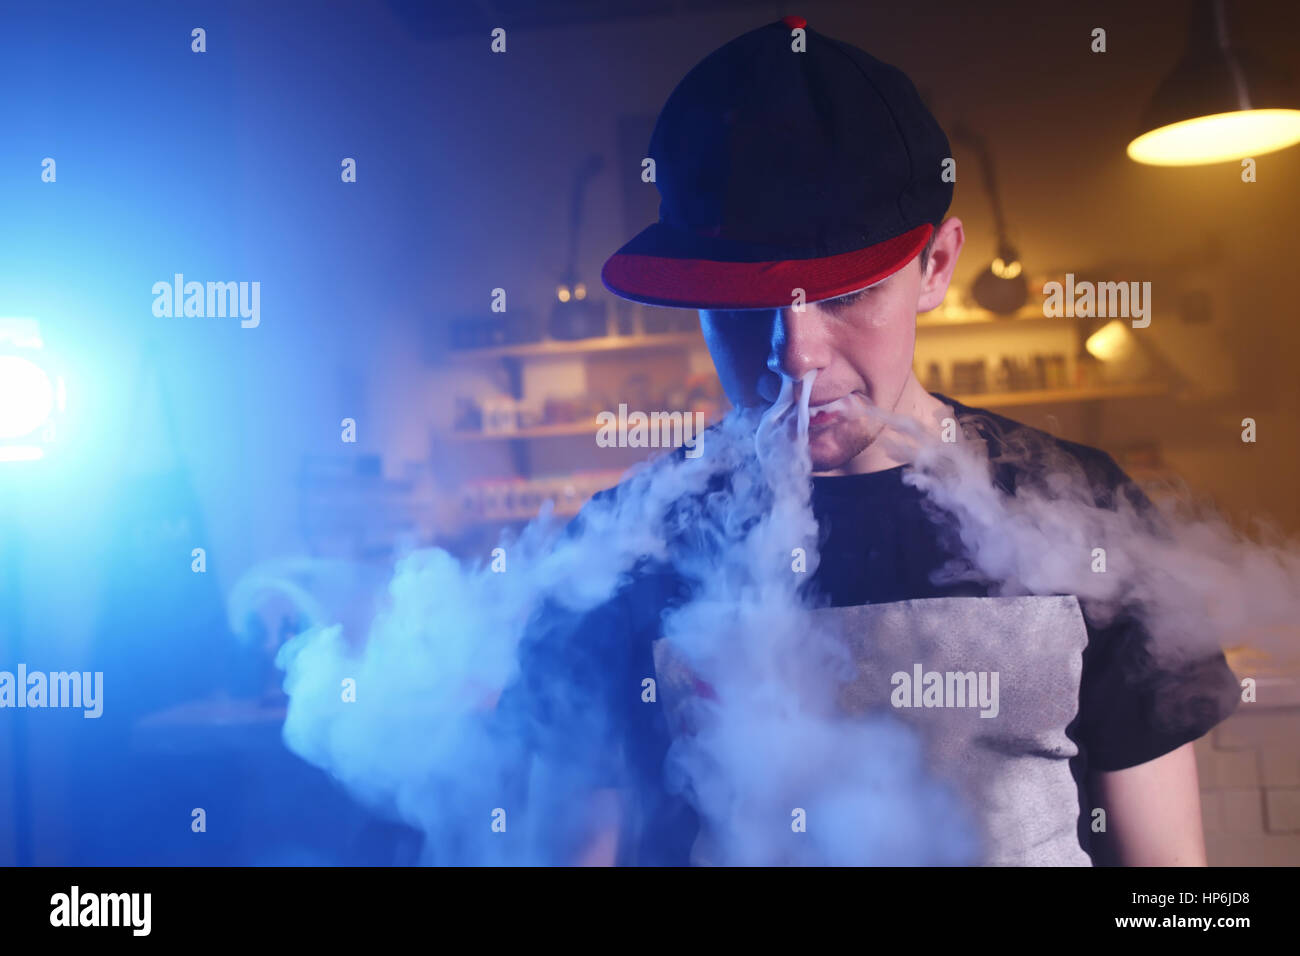 The man smoke an electronic cigarette at the vape shop. - Stock Image